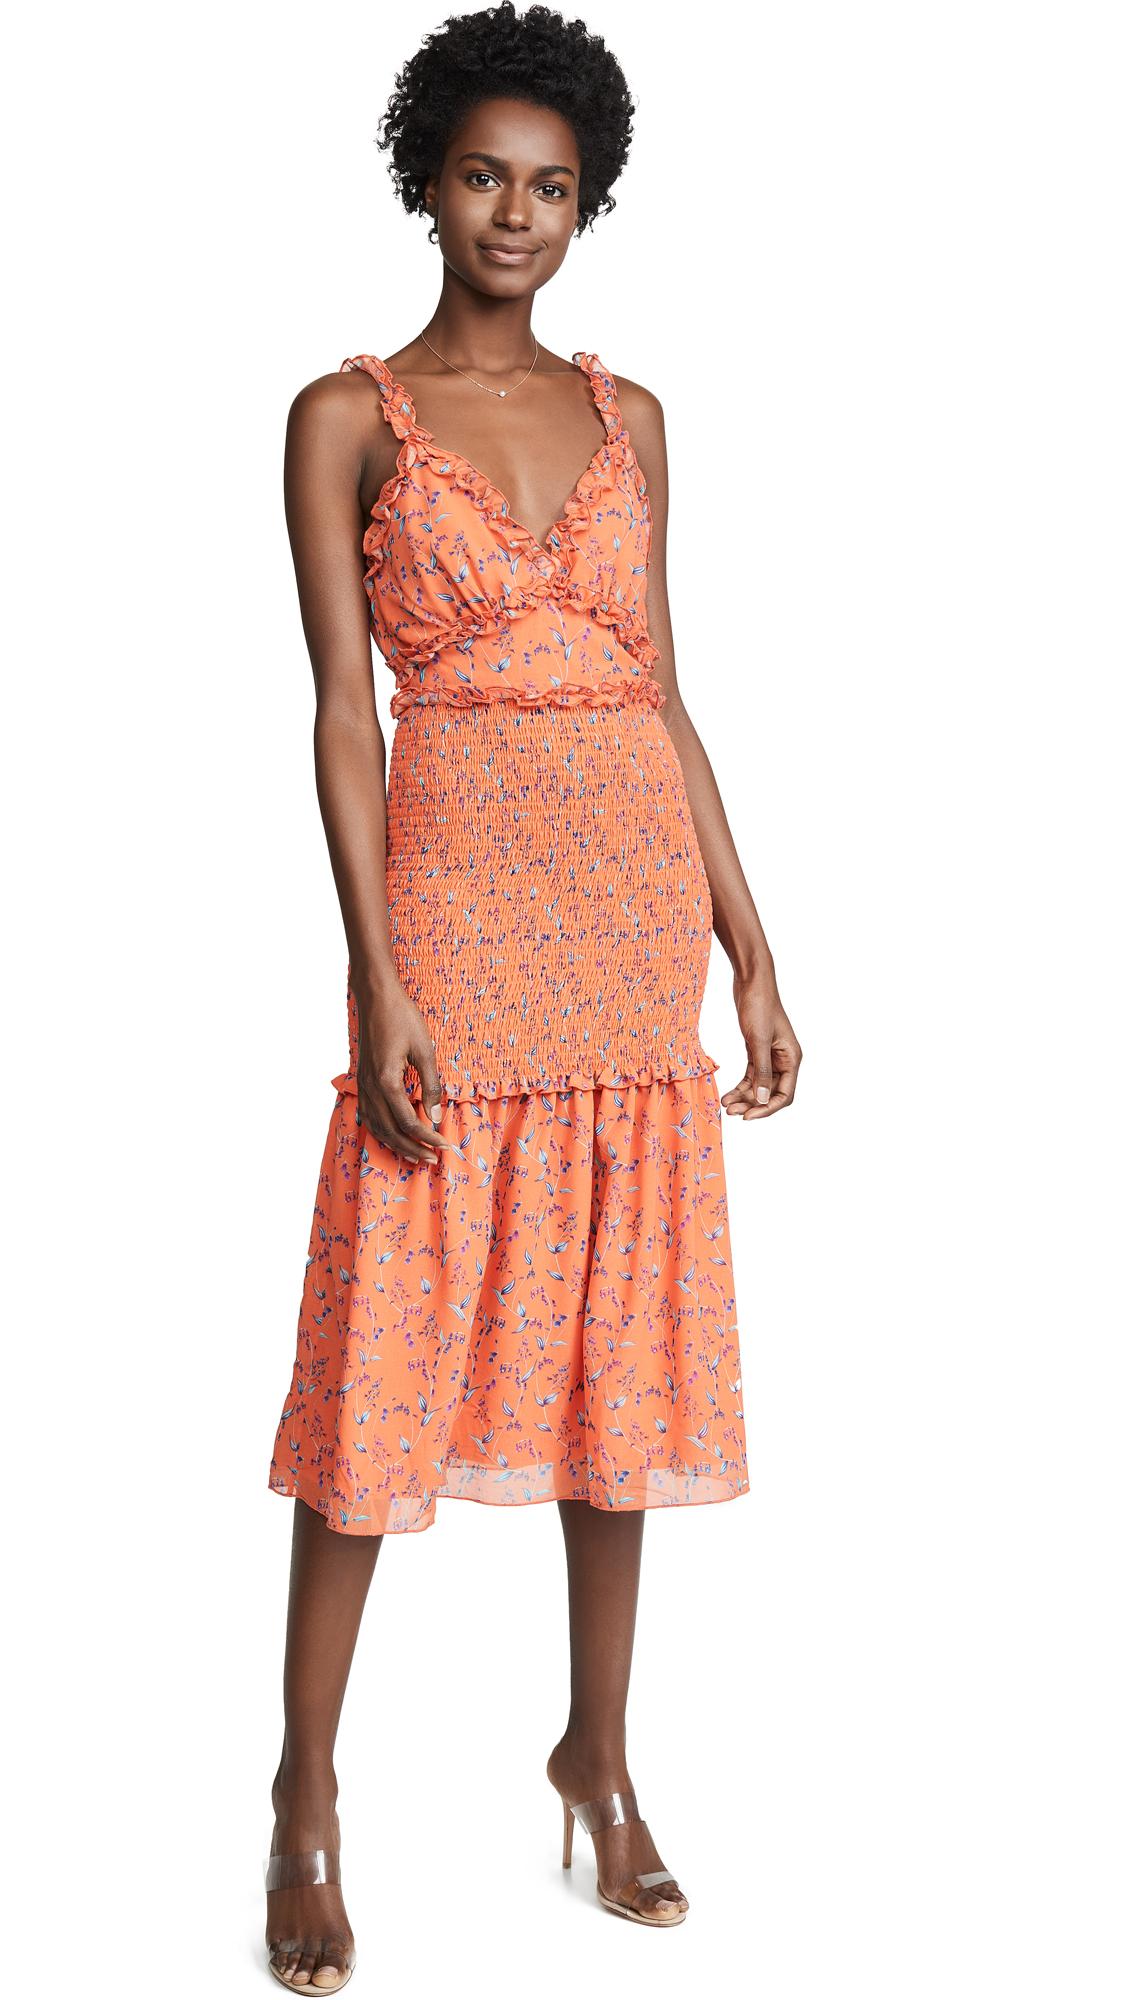 La Maison Talulah Daring Day Midi Dress in Bonnie Floral Print